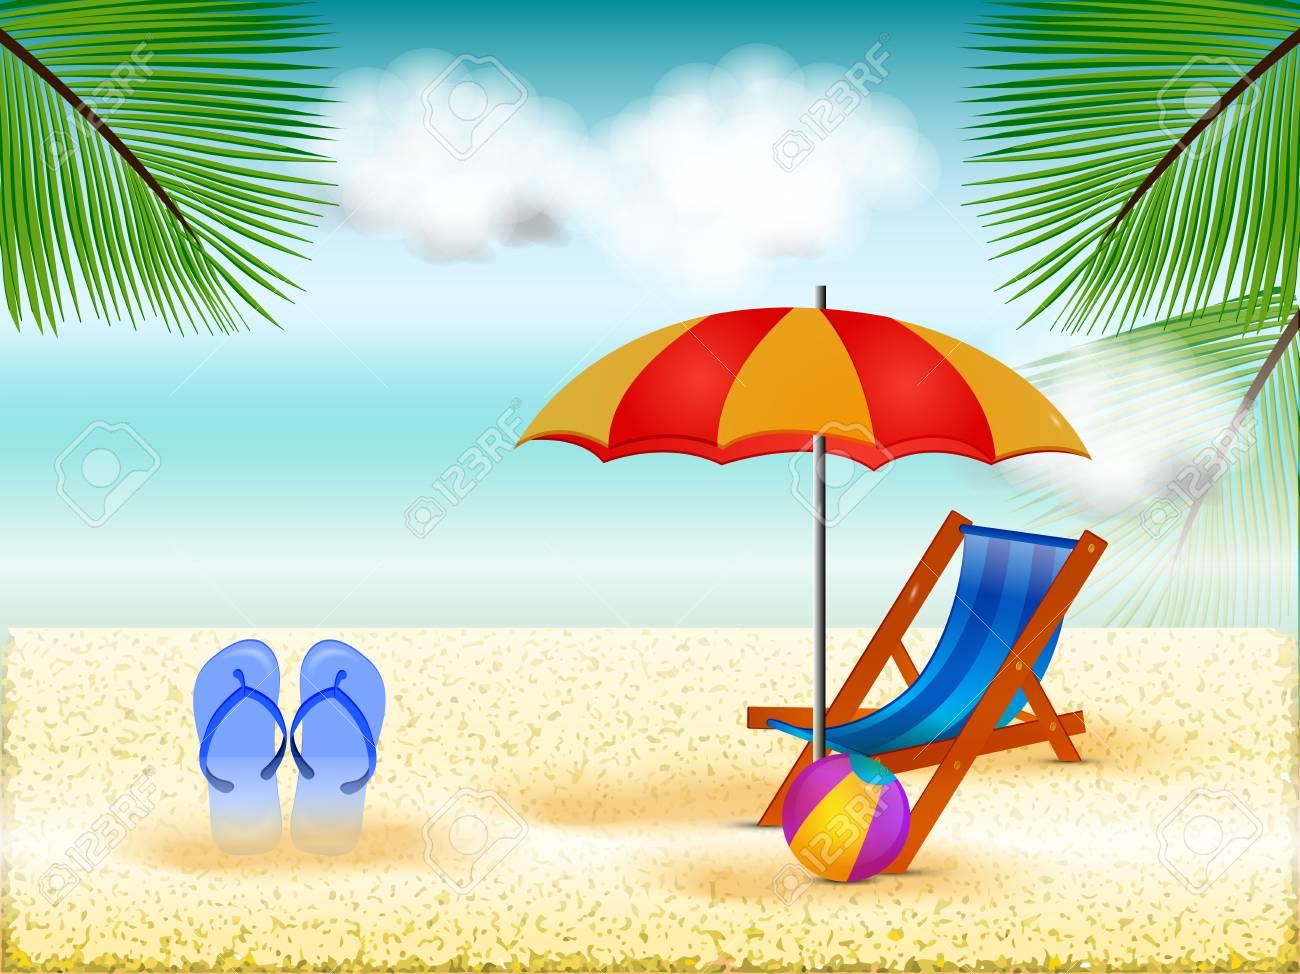 Image result for summer season images